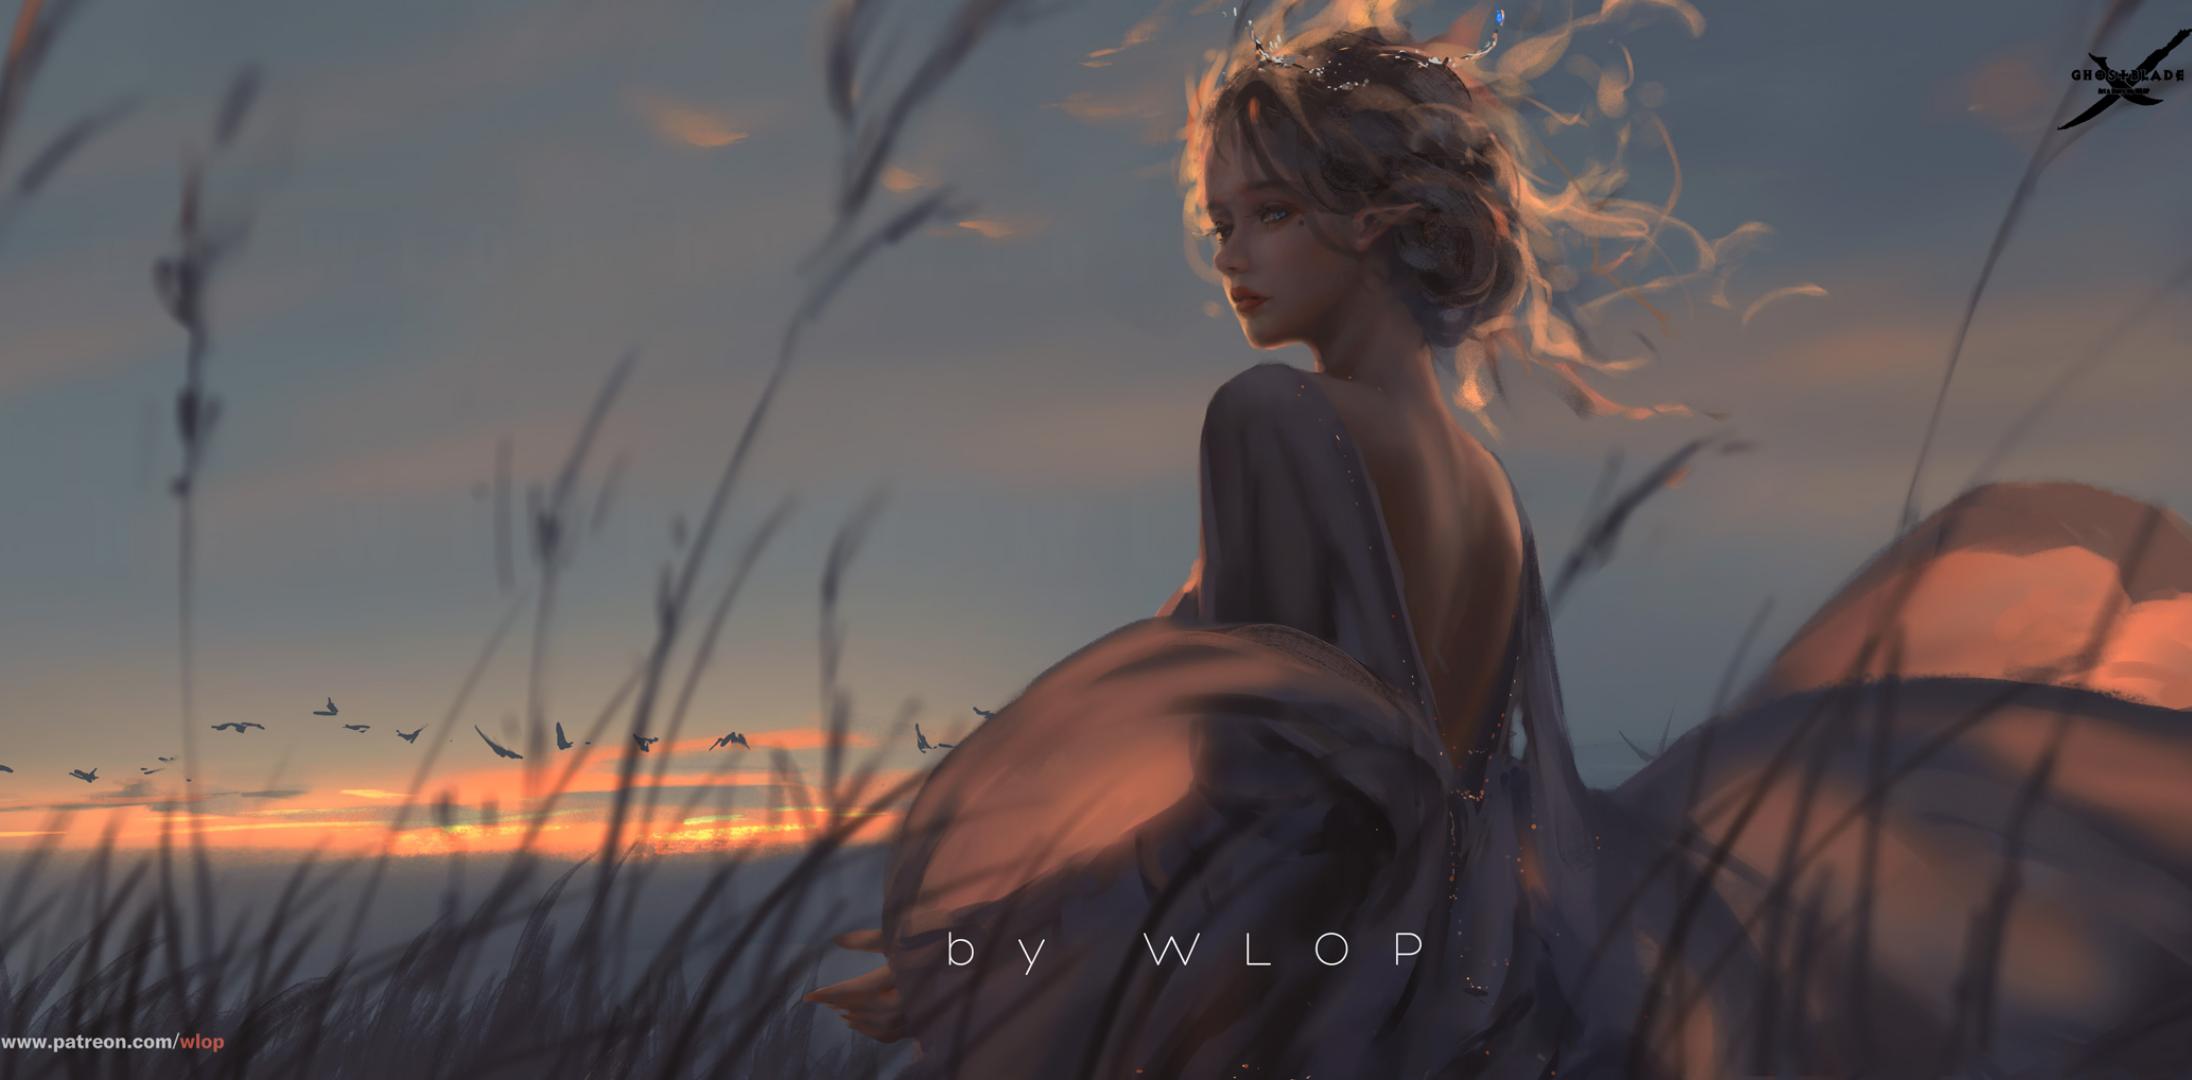 General 2192x1080 digital art fantasy girl sunset sky WLOP Ghostblade elves